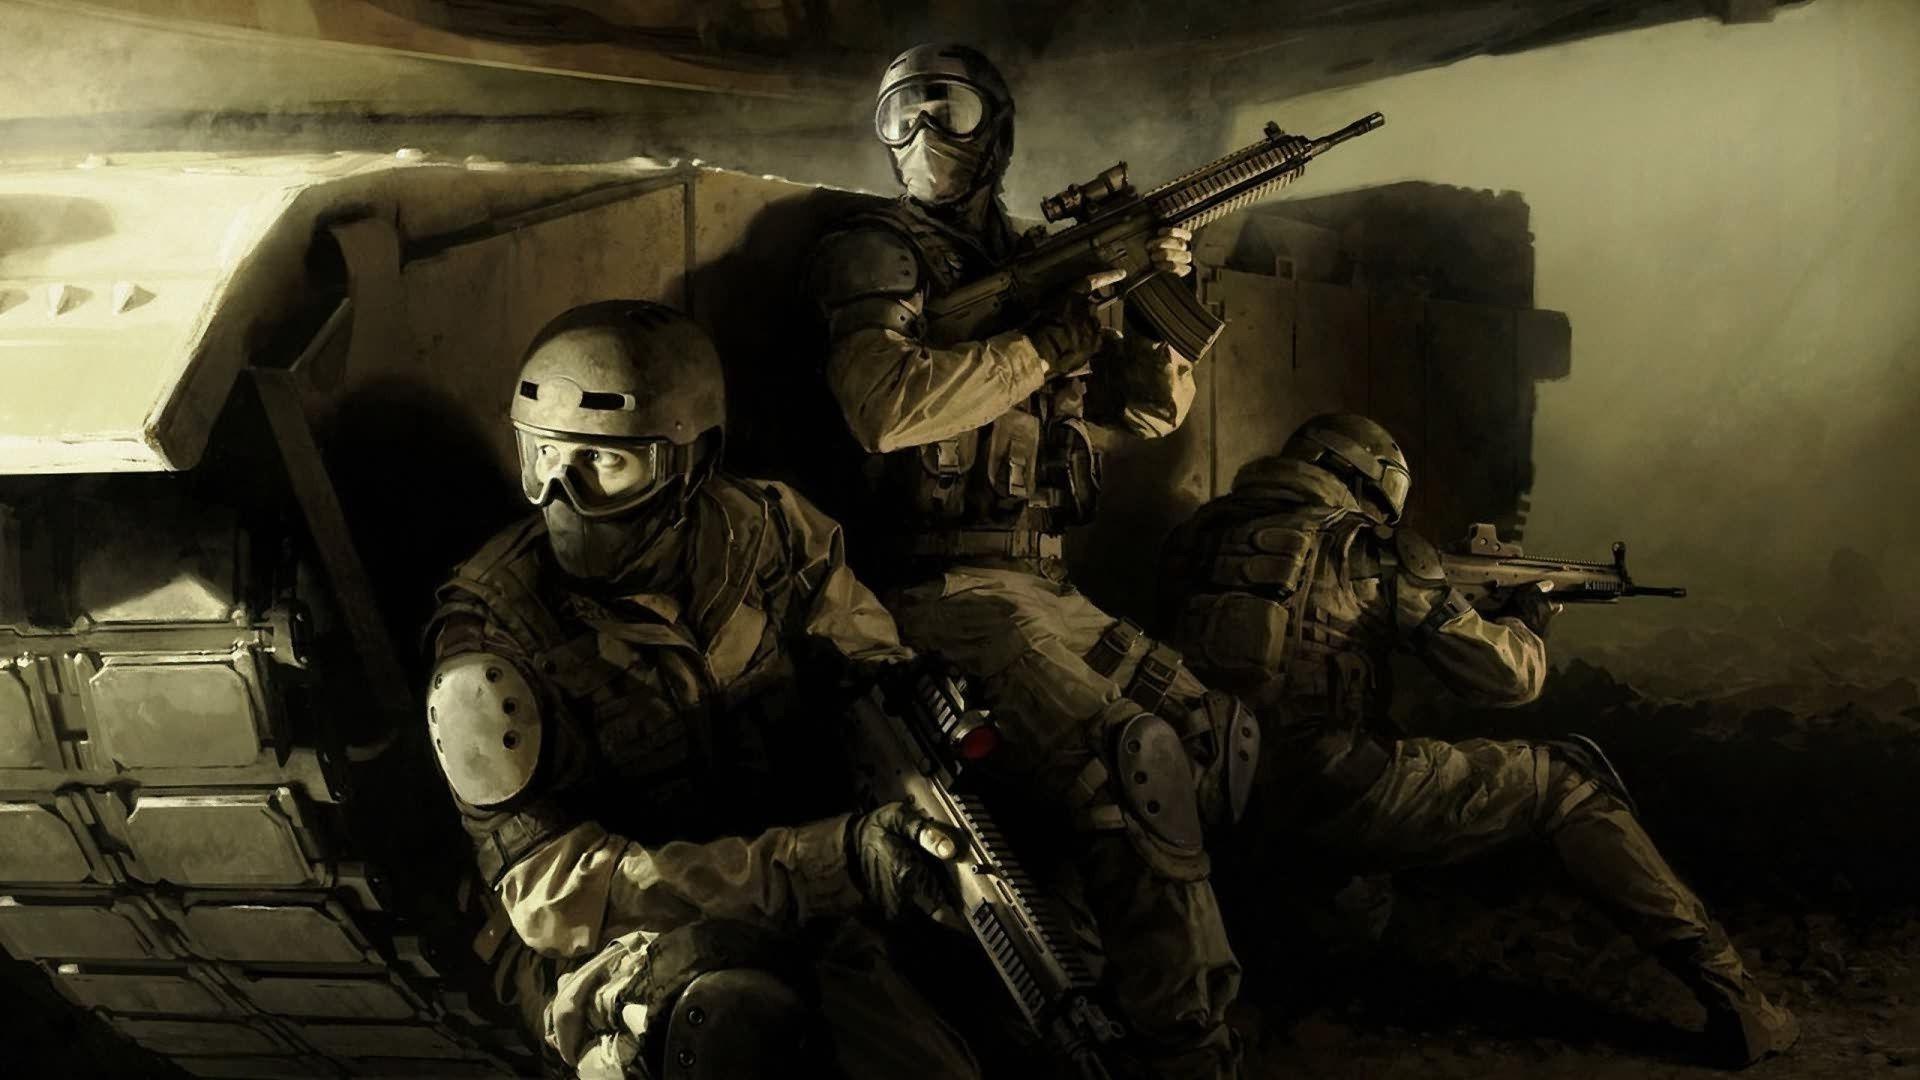 Swat Team Wallpaper 67 Images